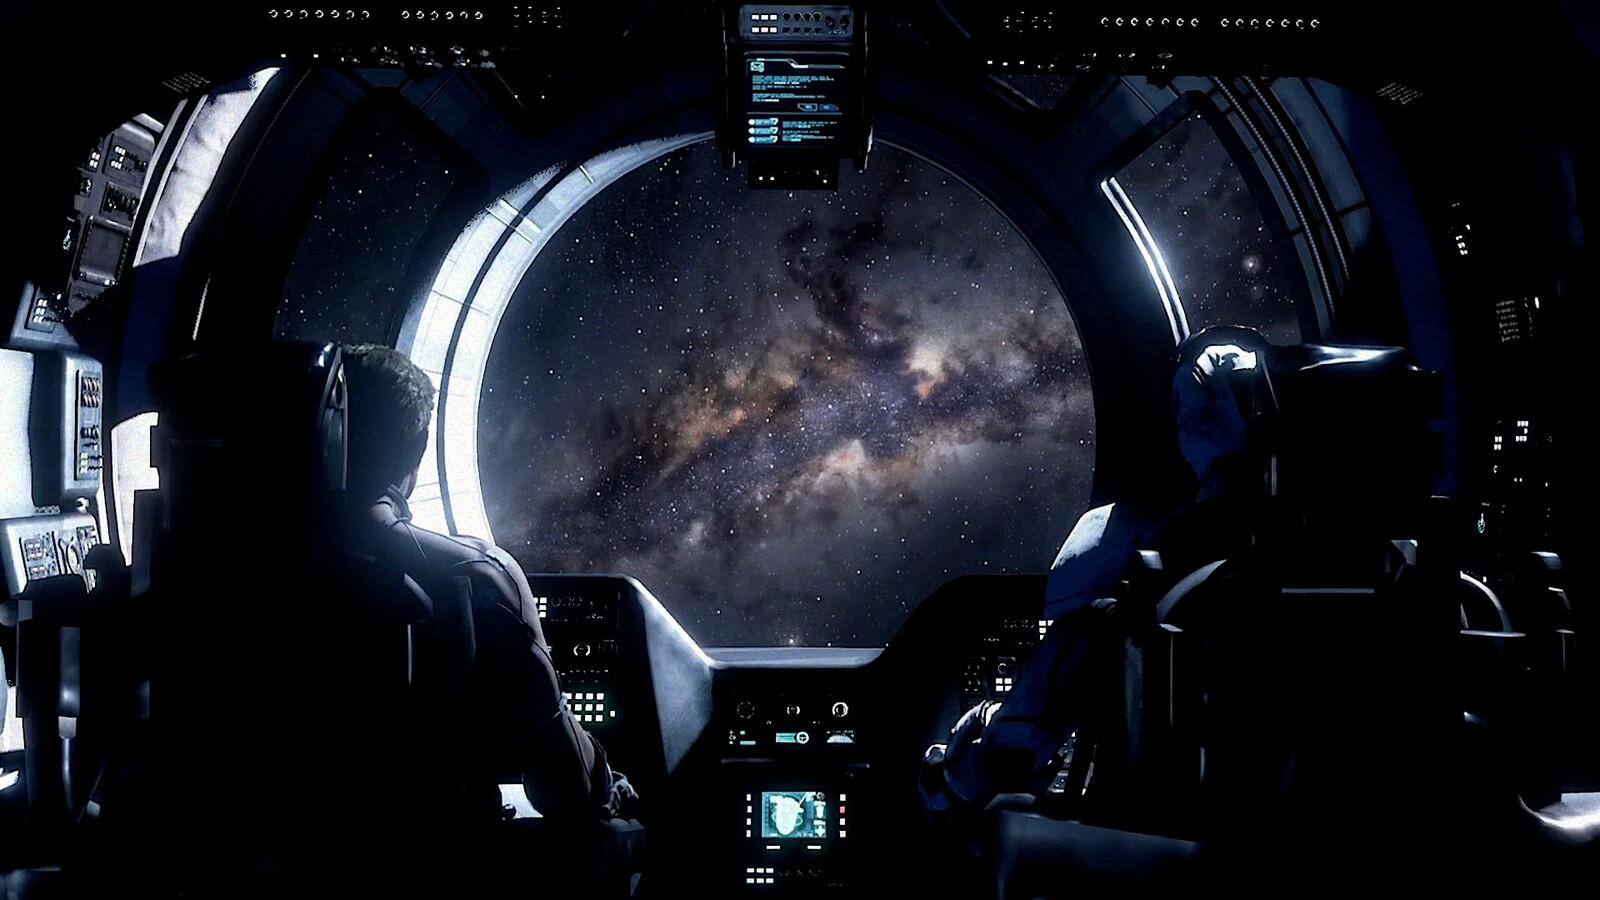 Spaceship: Modeling / Texturing